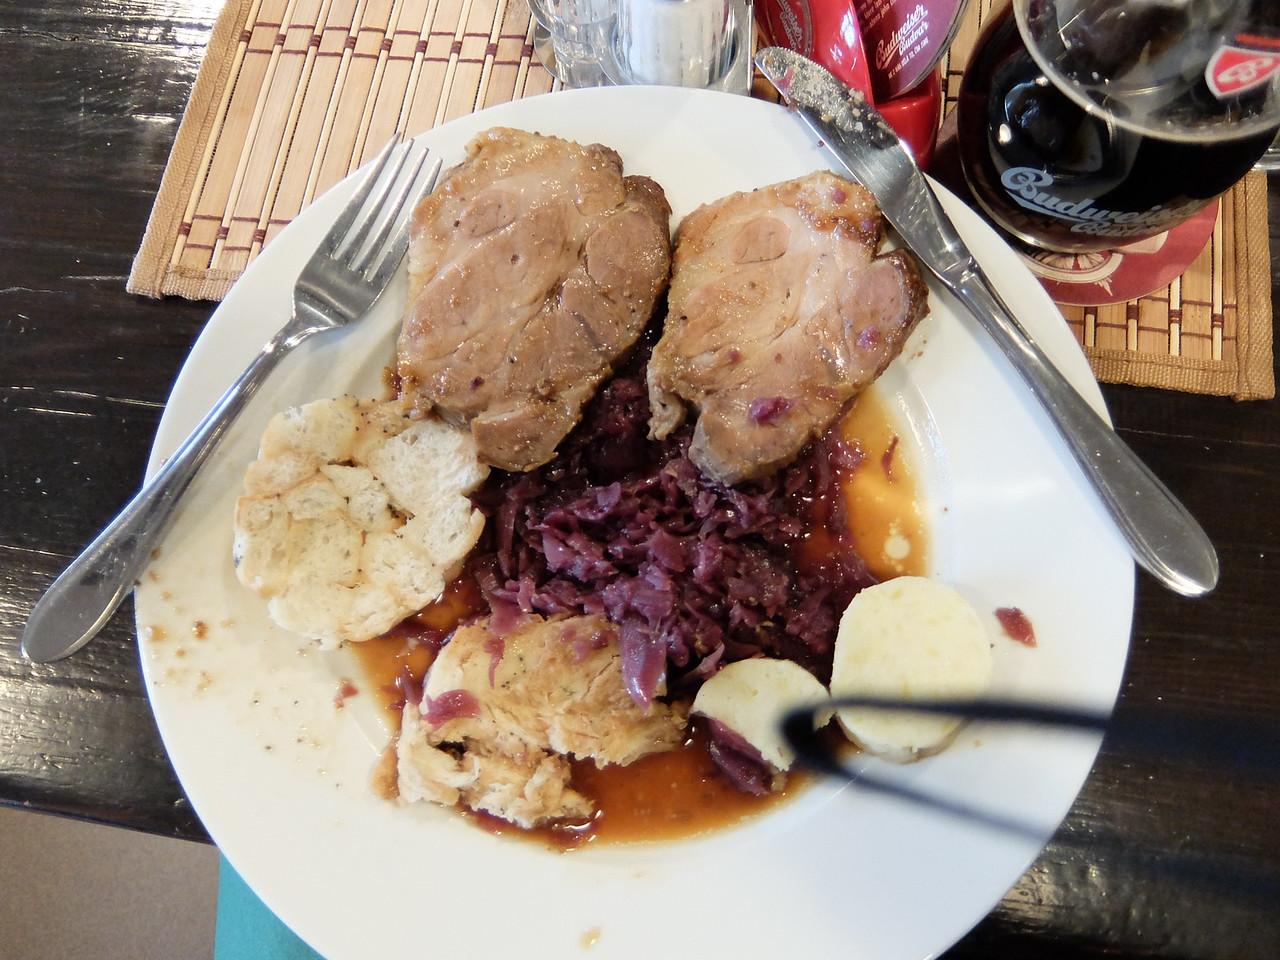 Pork butt, red cabbage and wonderful dumplings (knaidel) - fabulous dinner.